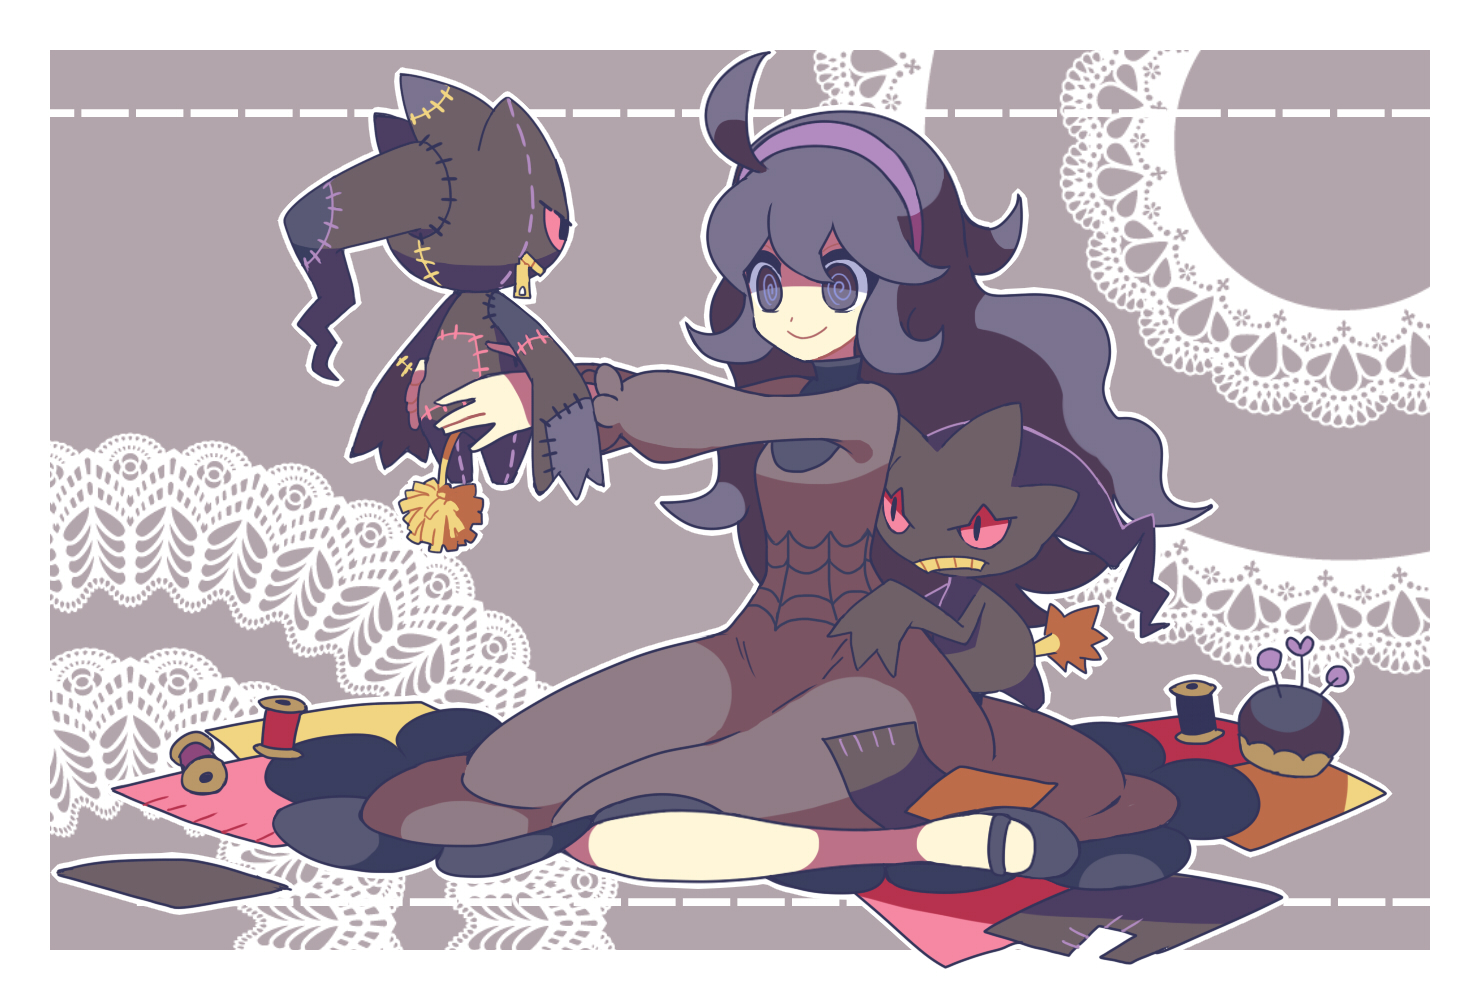 Hex maniac pok mon zerochan anime image board - Branette pokemon y ...